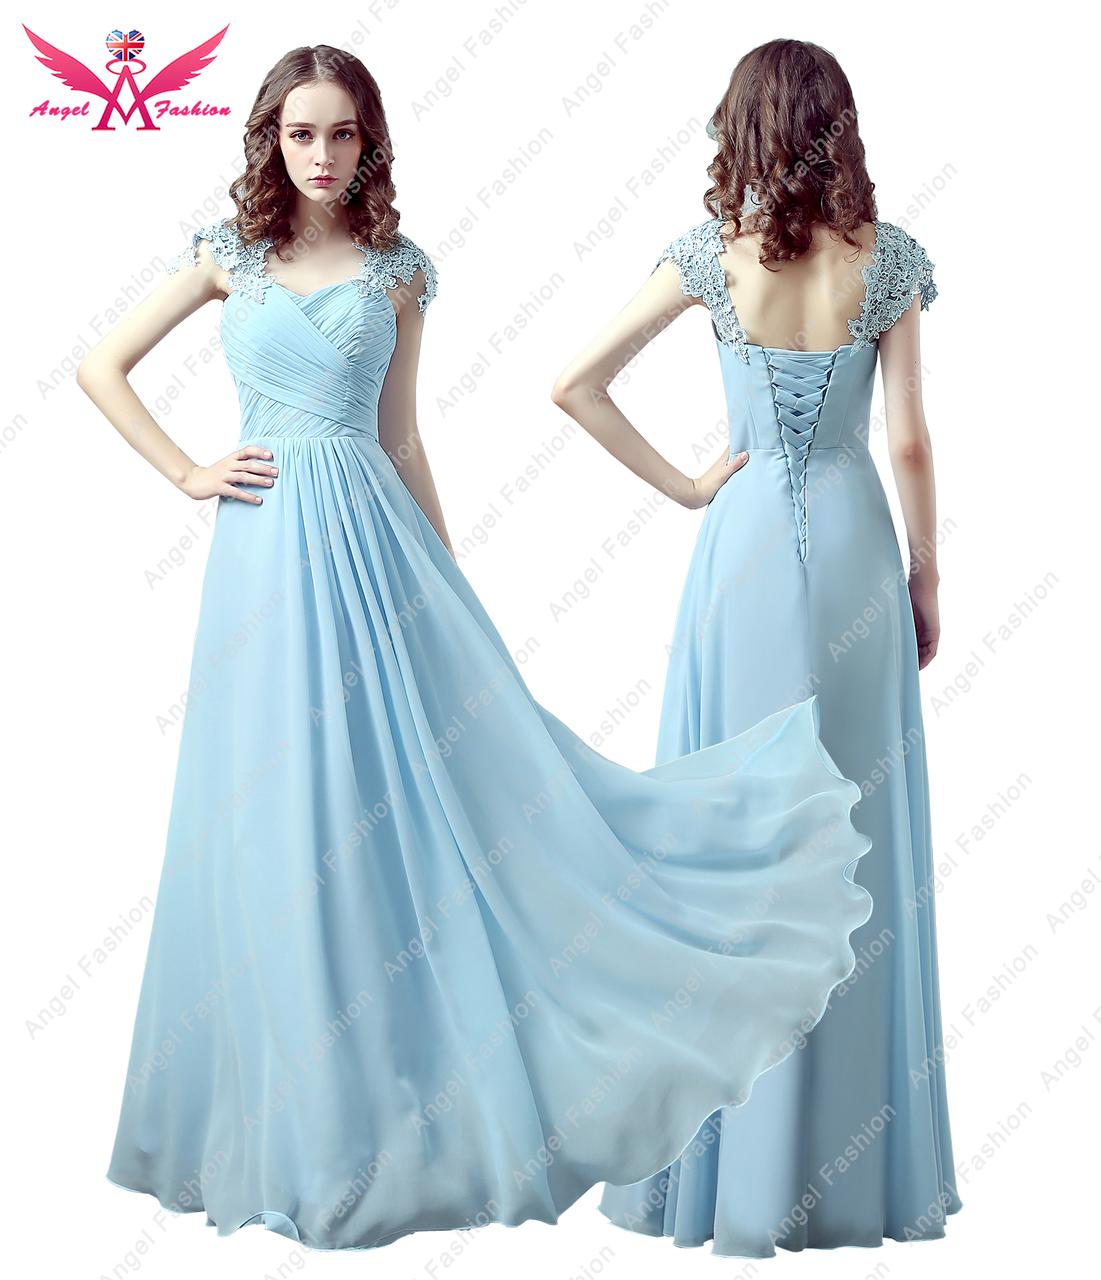 Fantastic Ebay Prom Dresses Collection - Colorful Wedding Dress ...